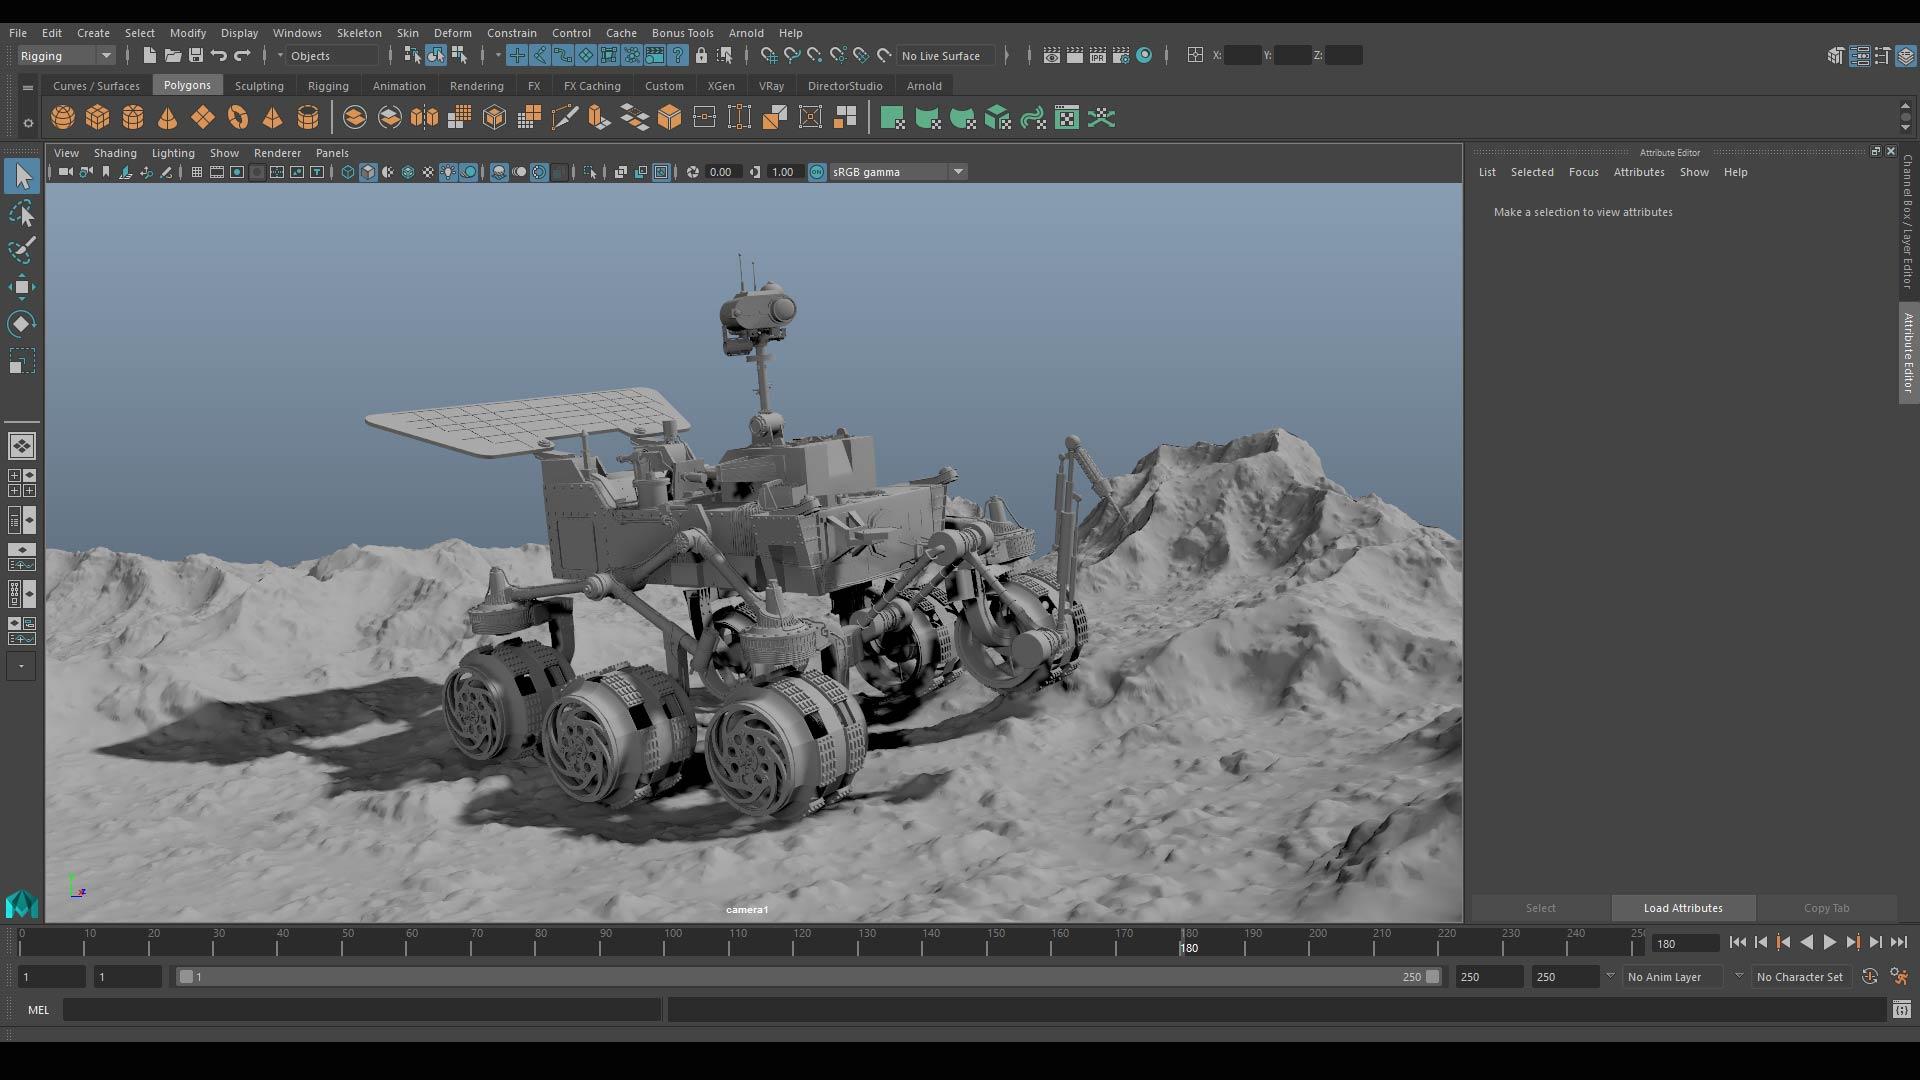 autodesk_maya_3d_graphics_mars_rover